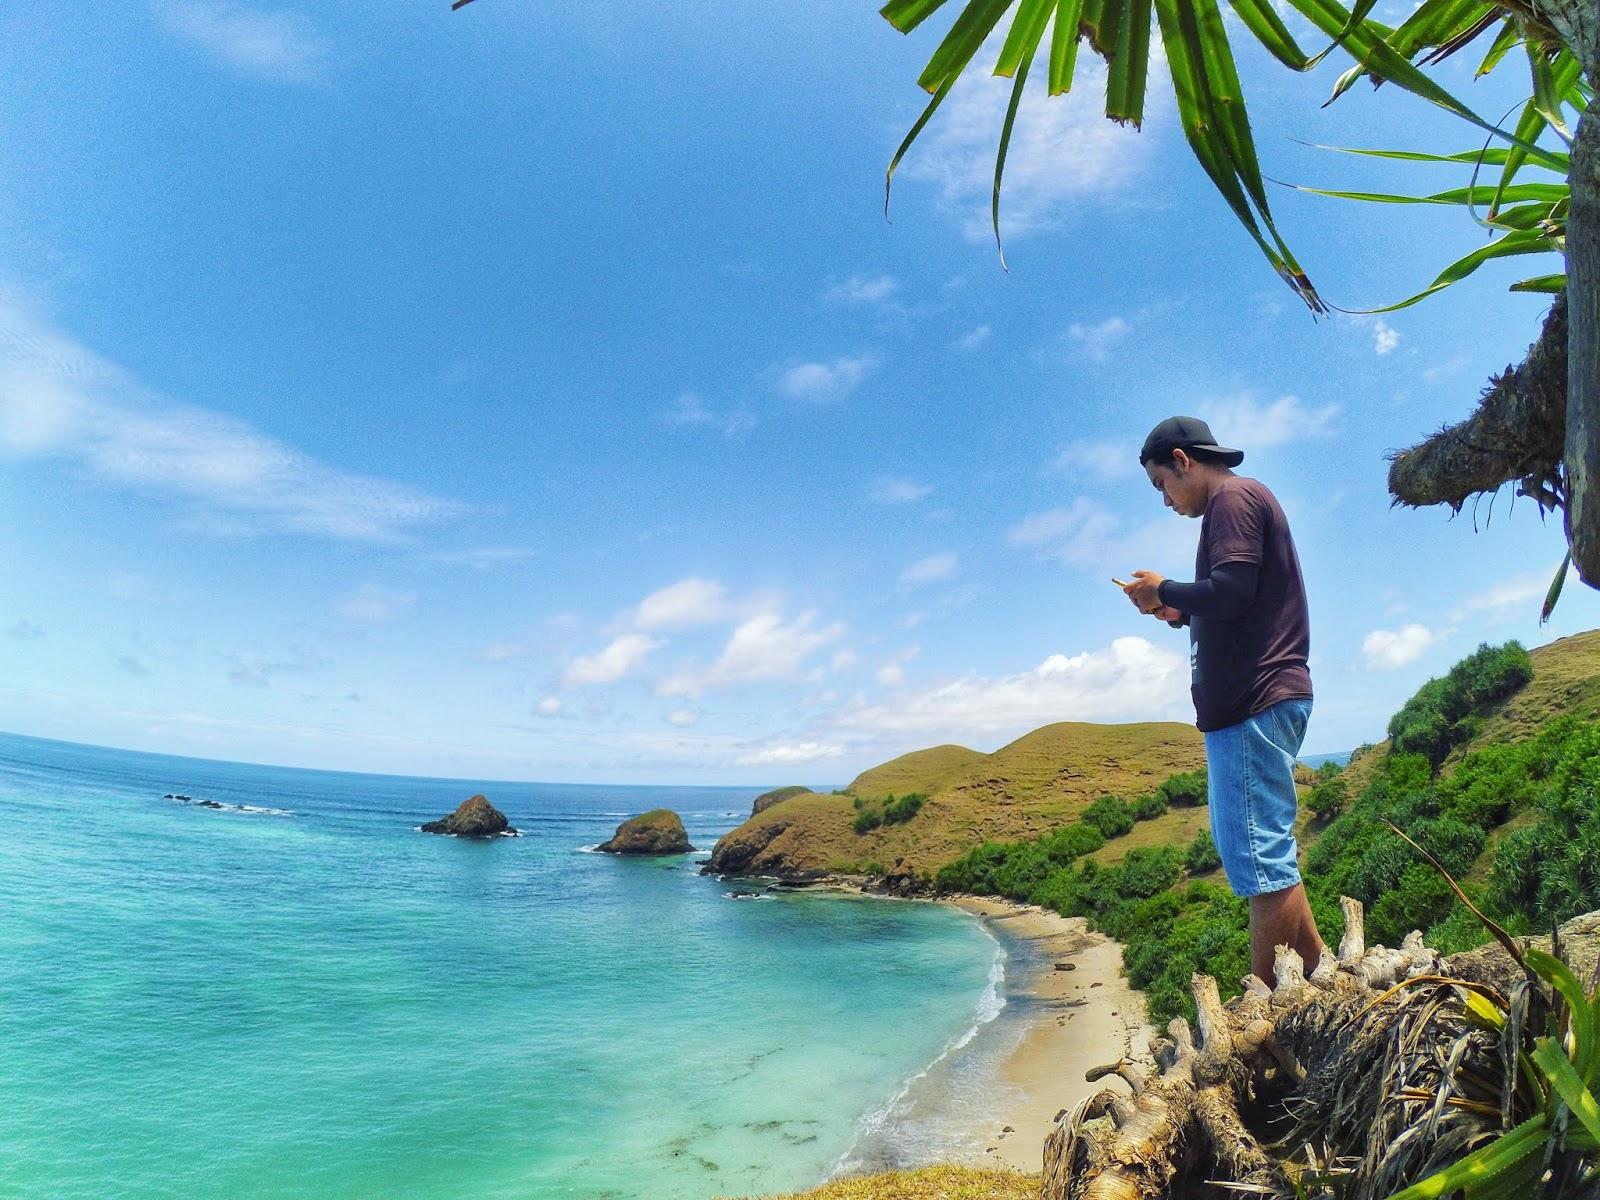 Cara Membuat Foto Awan Dan Laut Bergerak Tanpa Watermarklogo Secara